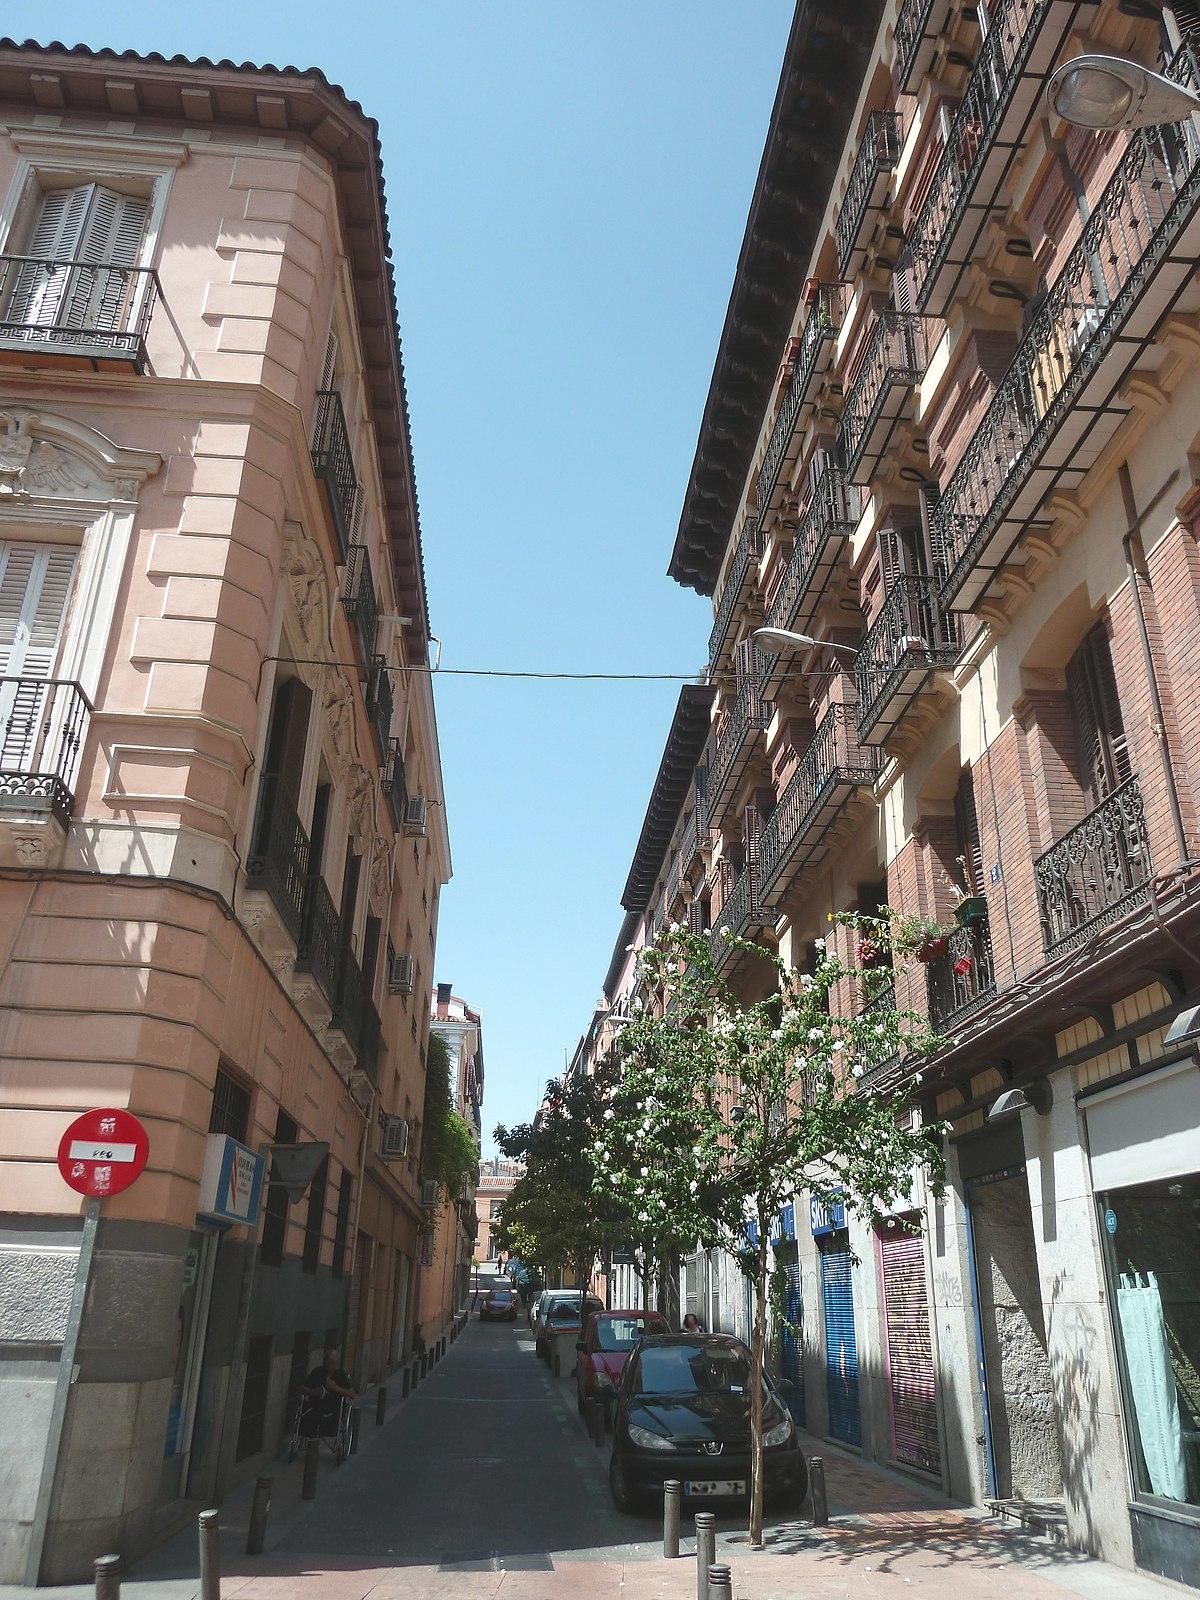 Calle de las pozas wikipedia la enciclopedia libre - Calle nebulosas madrid ...